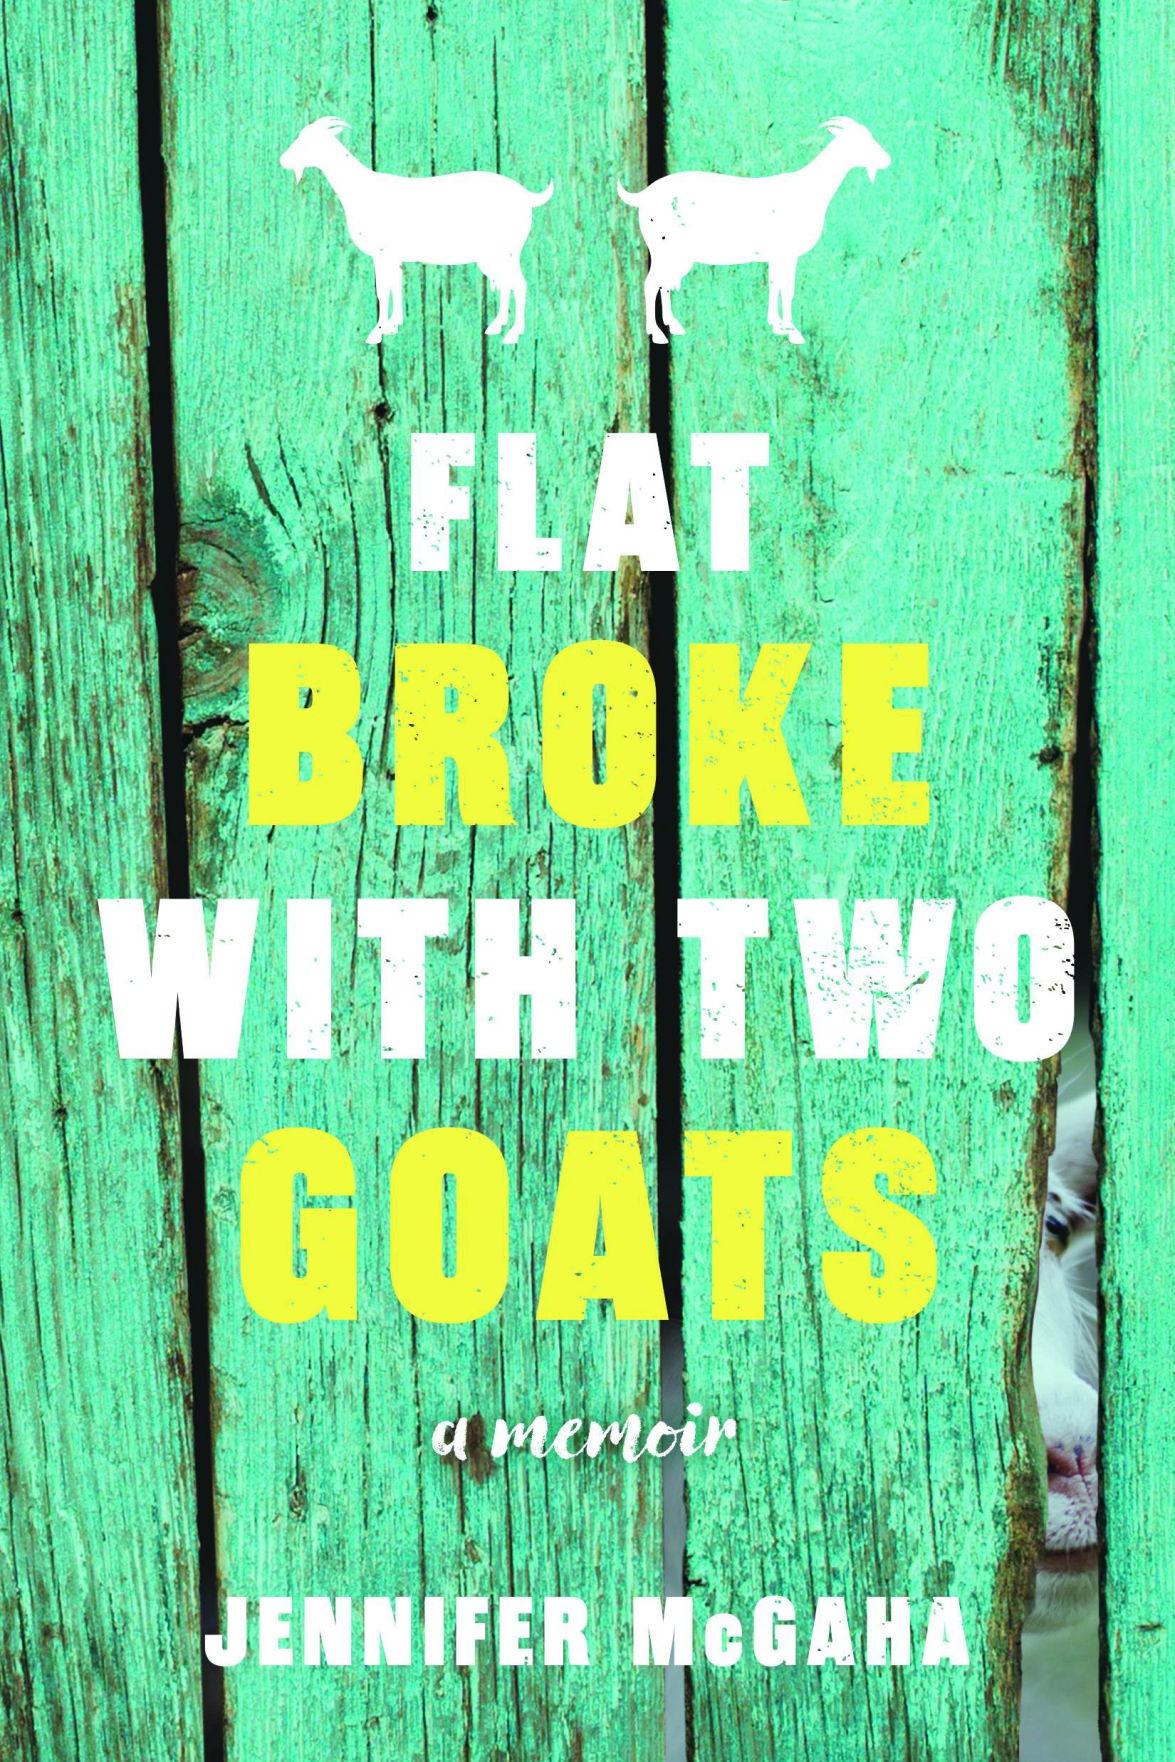 'Flat Broke with Two Goats: A Memoir of Appalachia,' by Jennifer McGaha